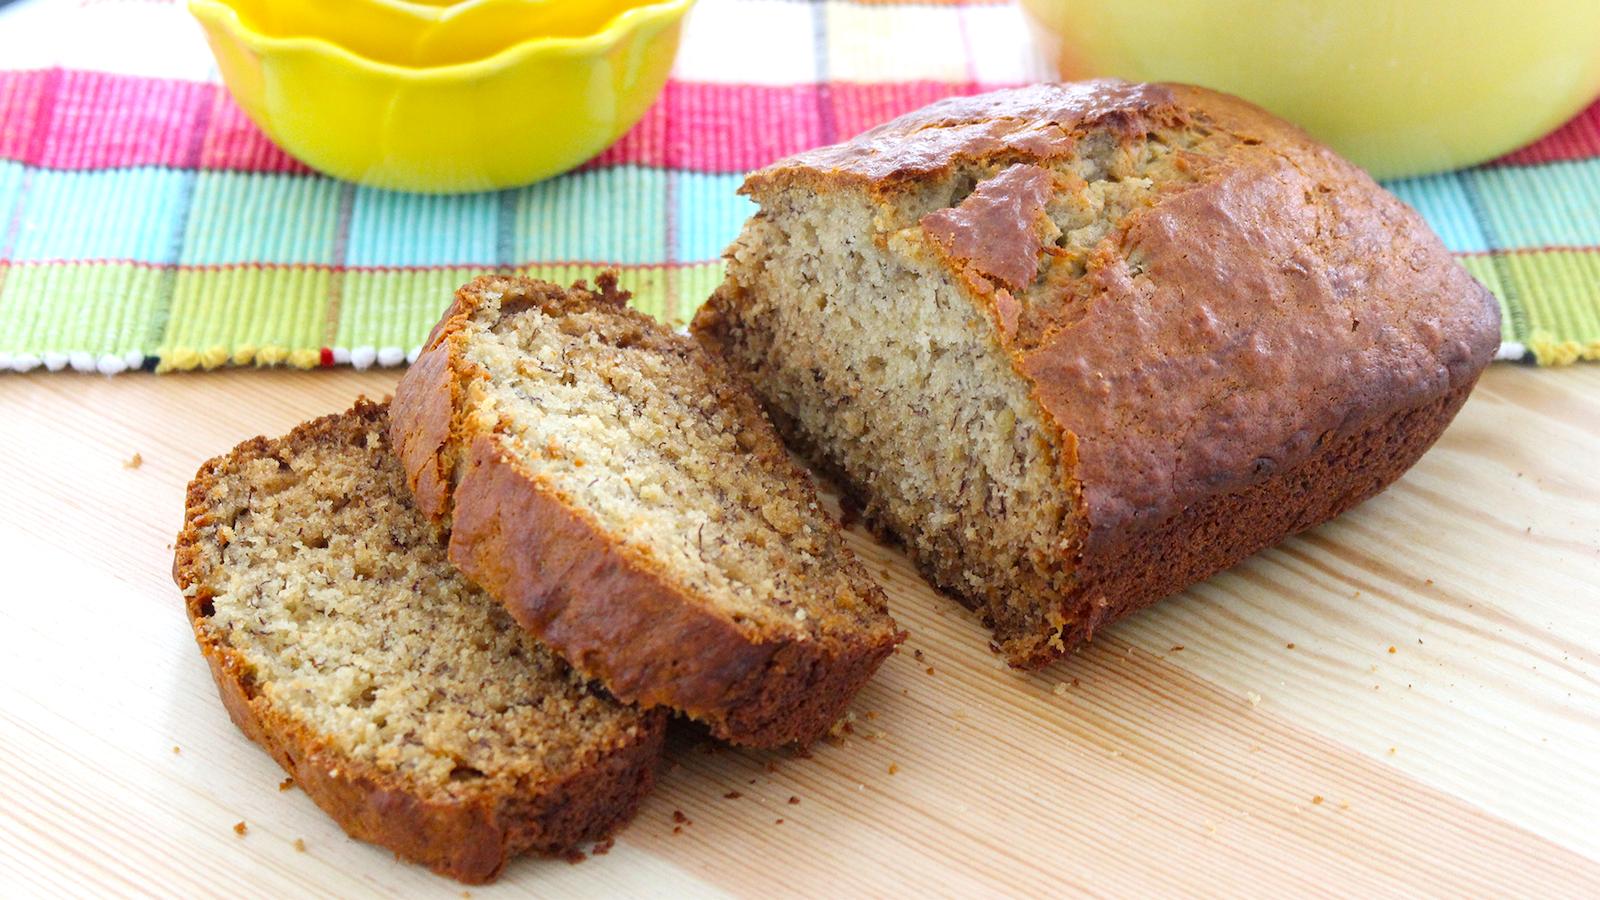 bread sliced How to Make Vegan Banana Bread main image